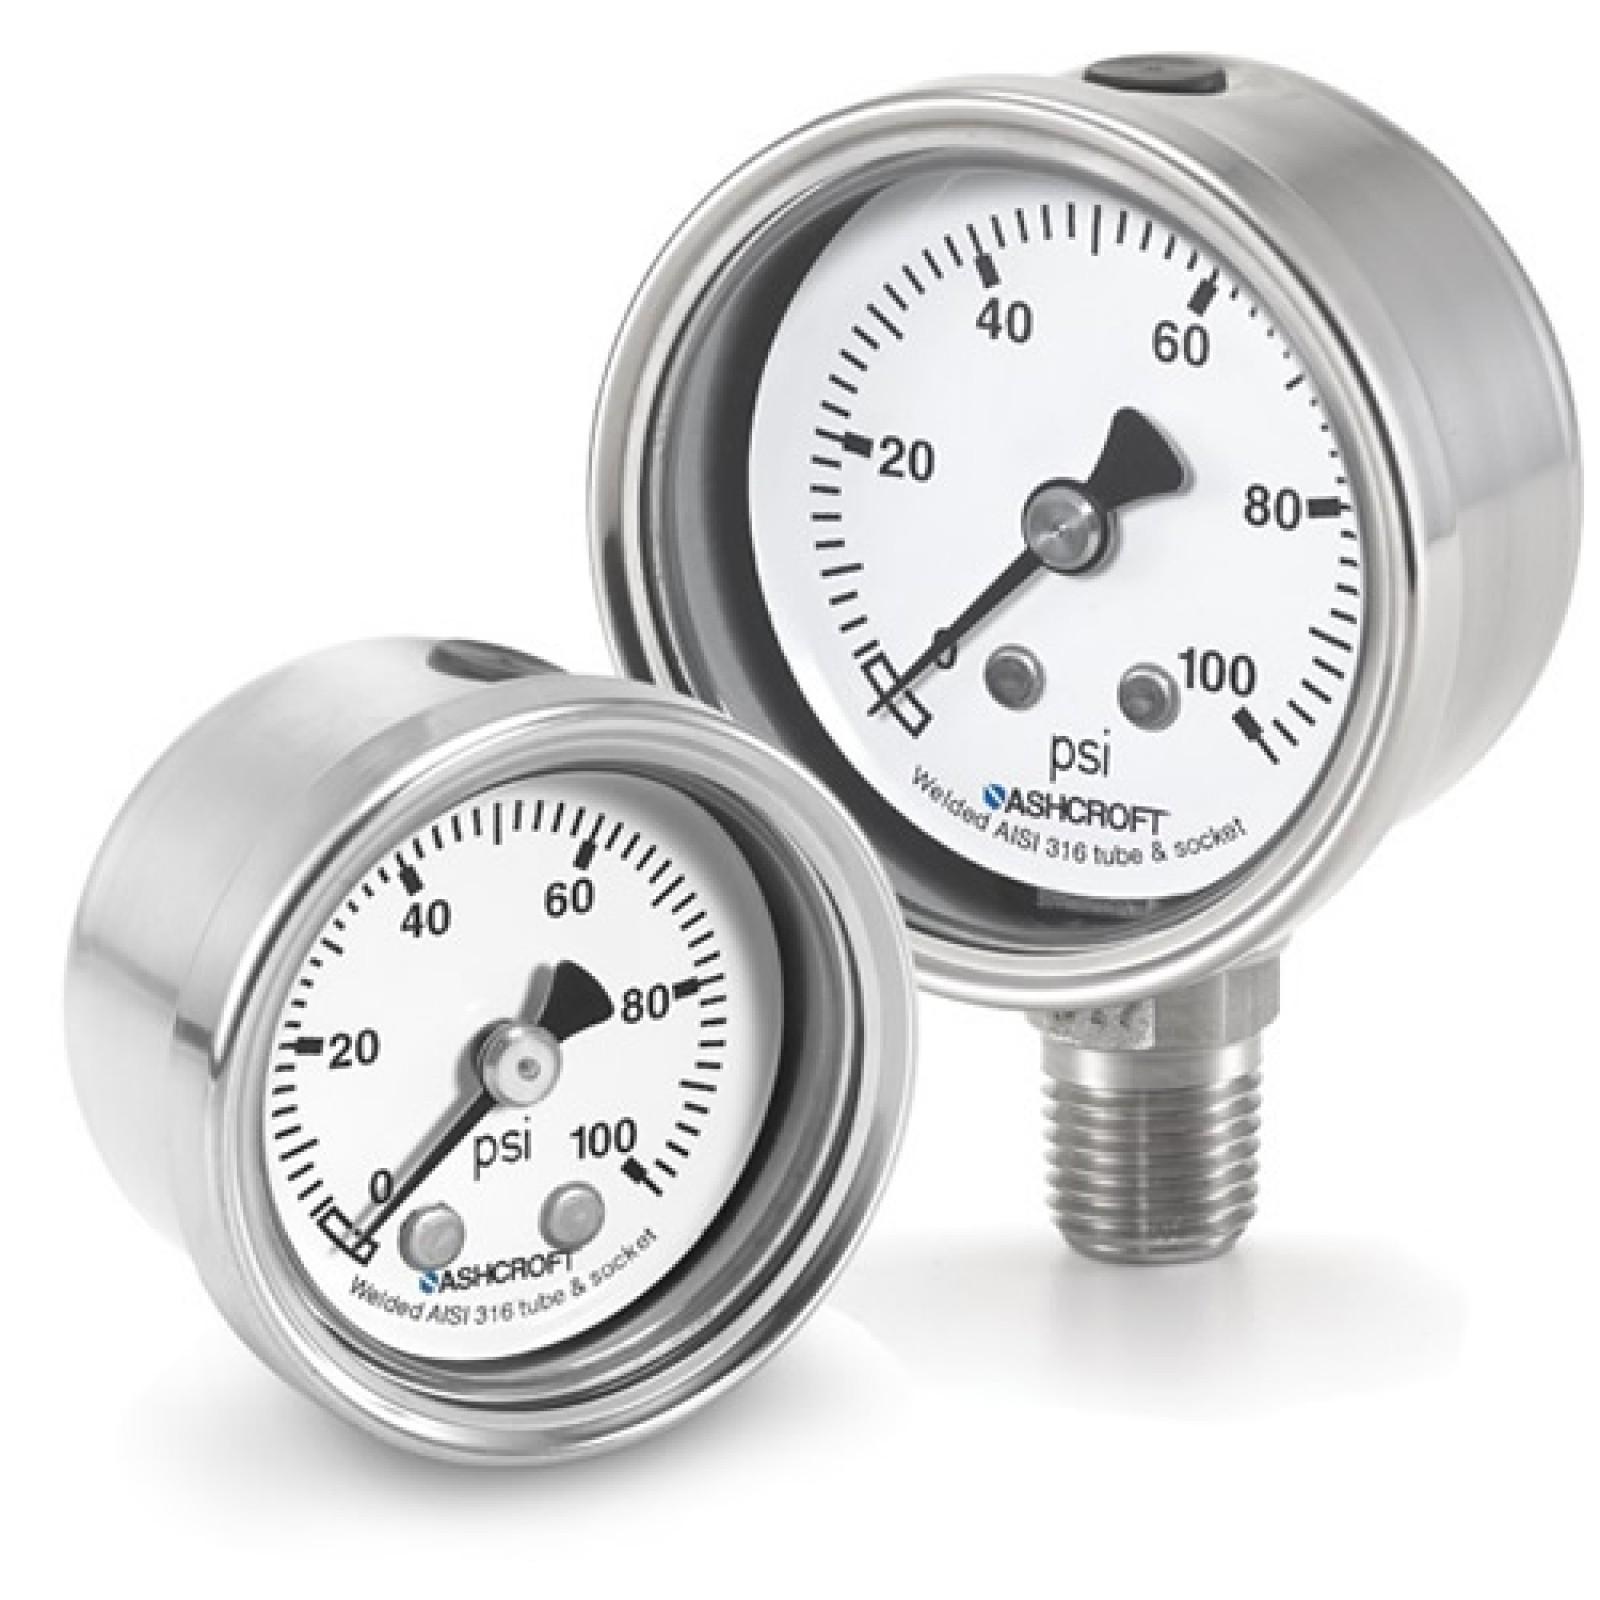 "10 1008S 02L XLL 7500#/KP - Pressure Gauge, 100mm stainless 1/4"" NPT Lower conn & Case, Plus Performance, 0/7500 psi"